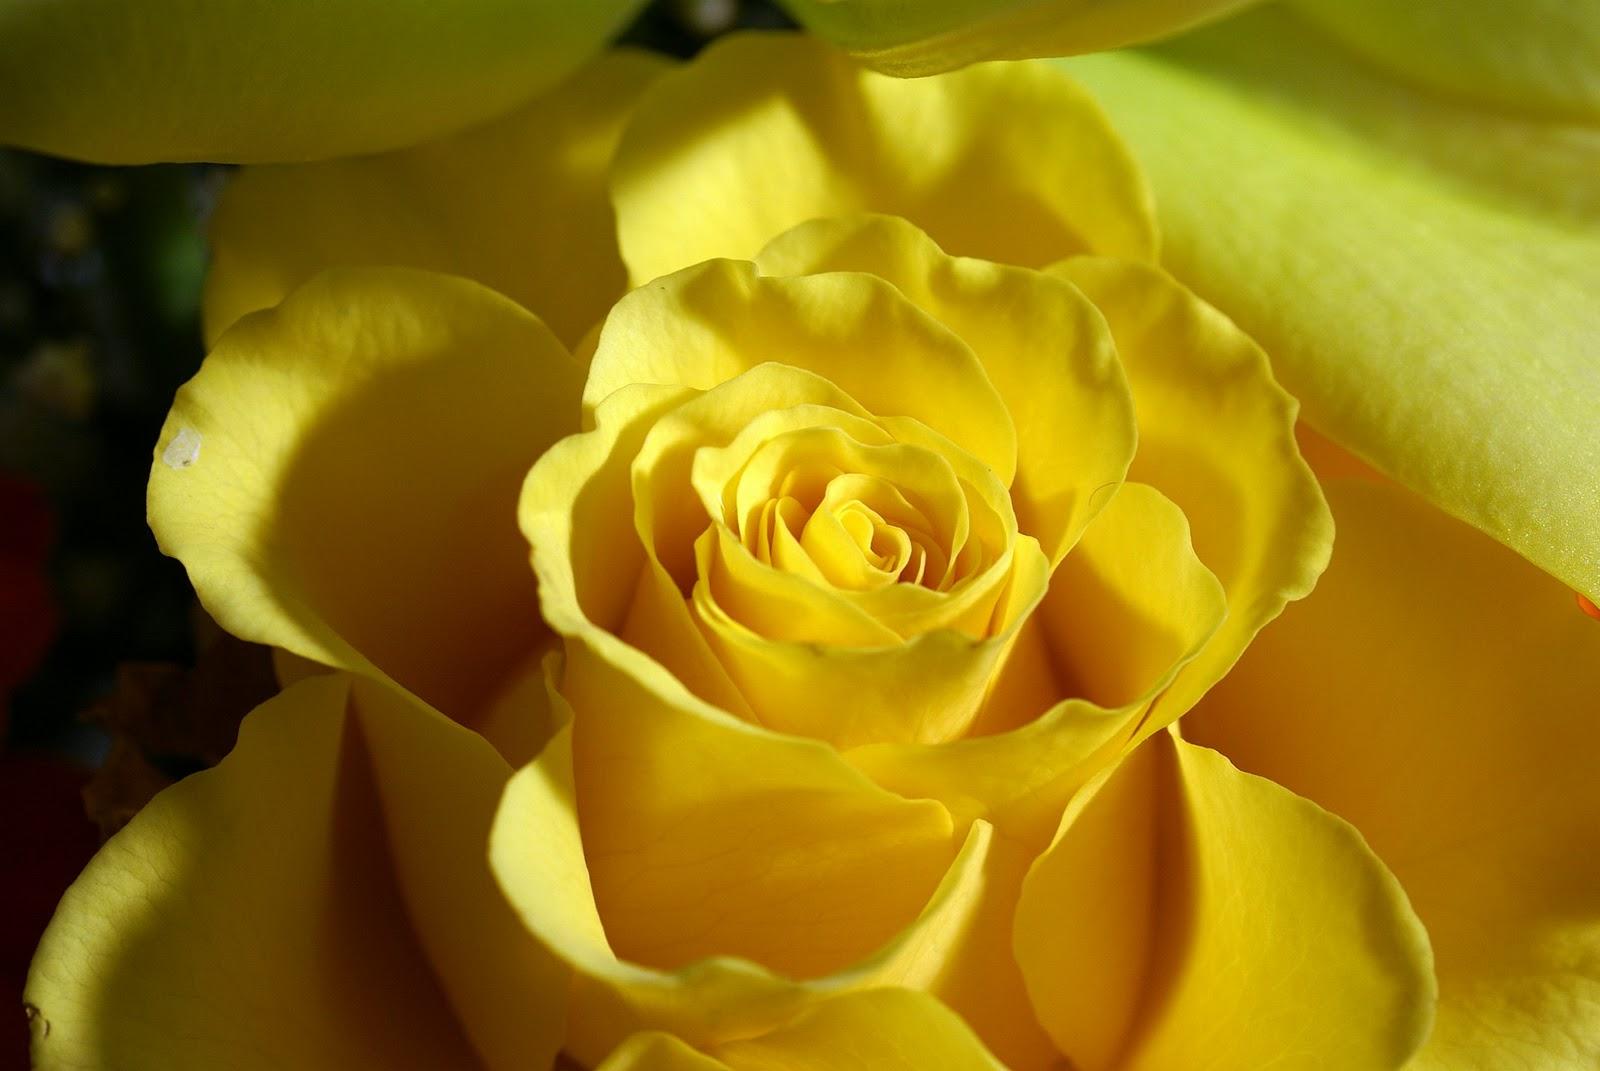 yellow rose 14149